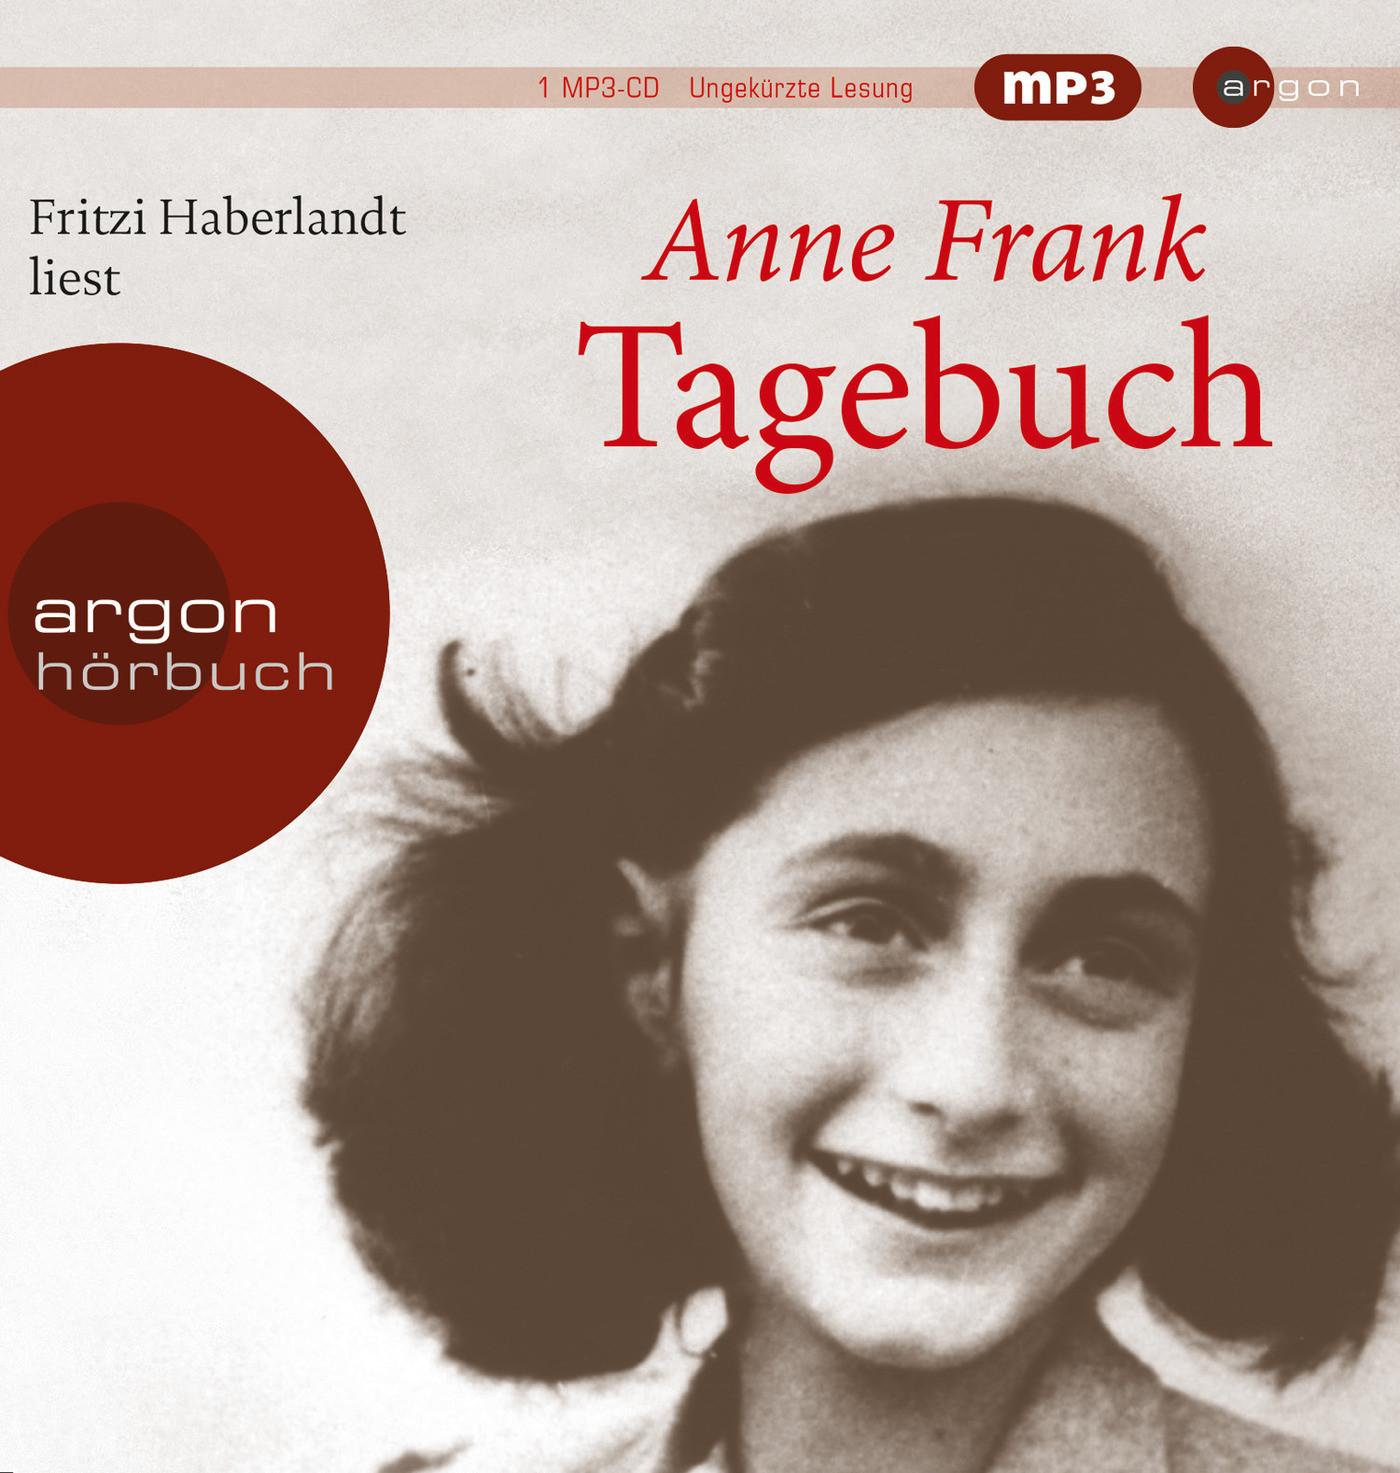 Anne Frank - Tagebuch (MP3-Ausgabe)